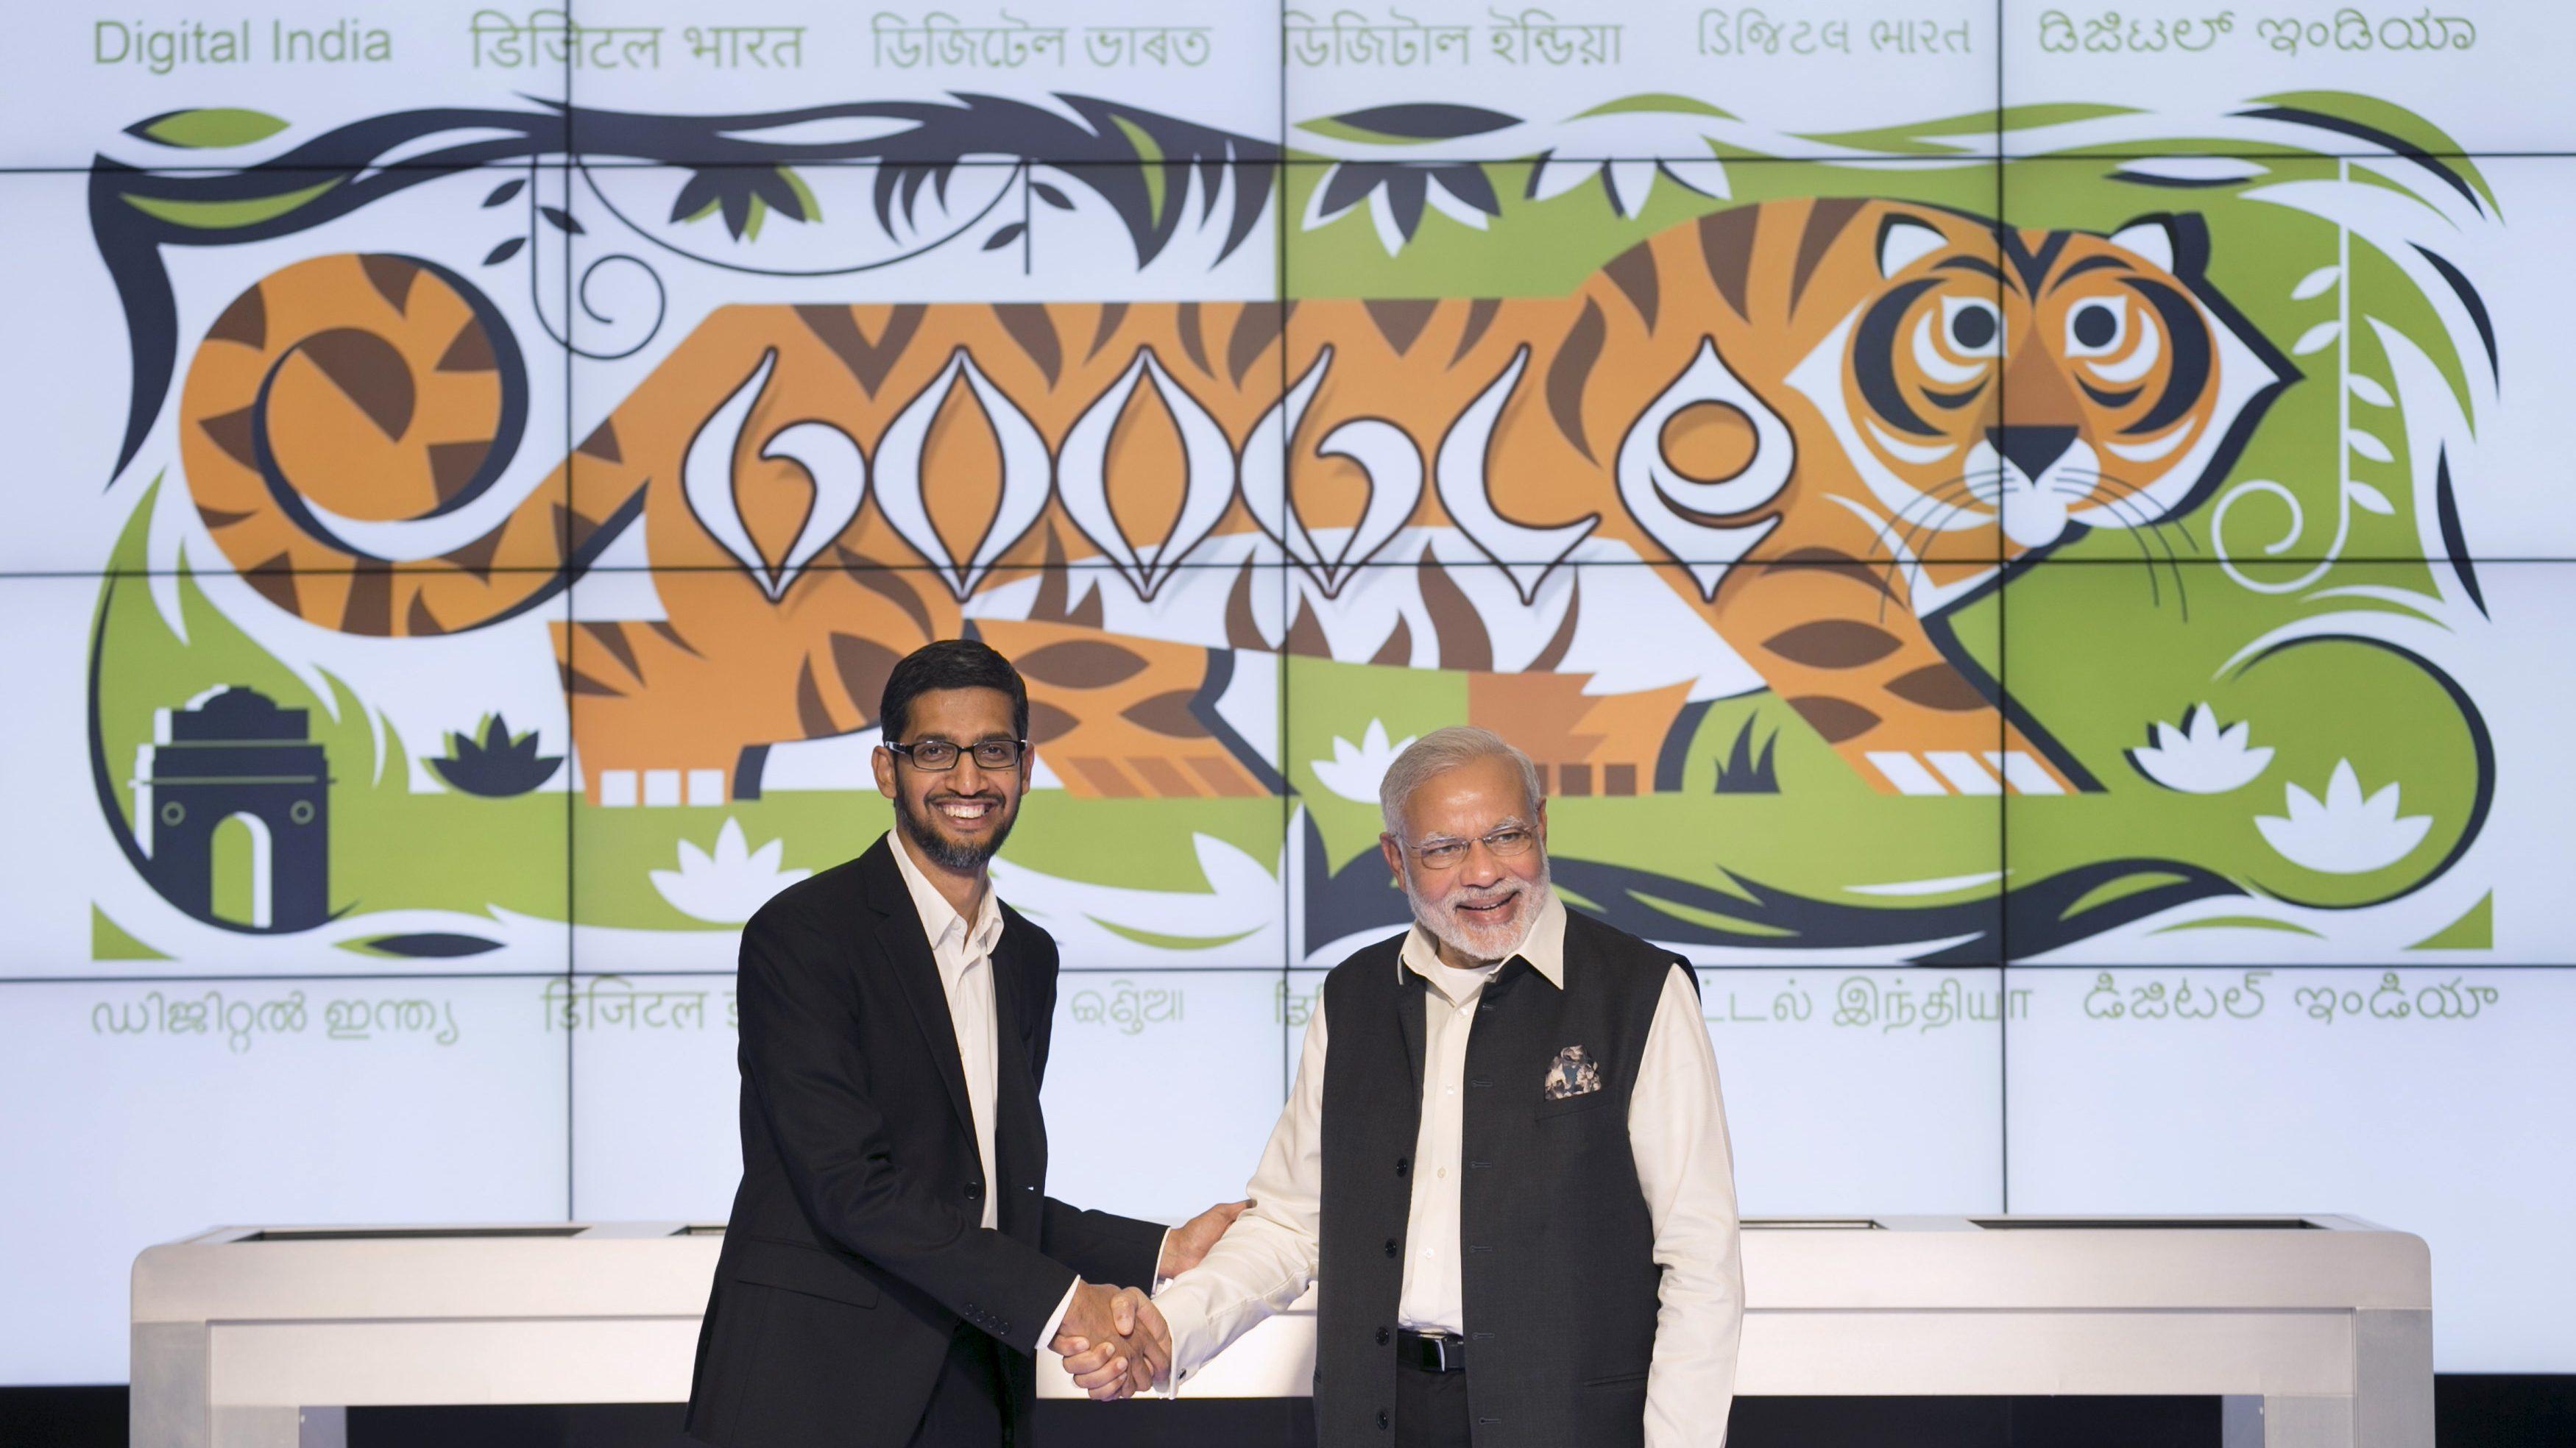 Modi government ramps up Twitter, Facebook censorship